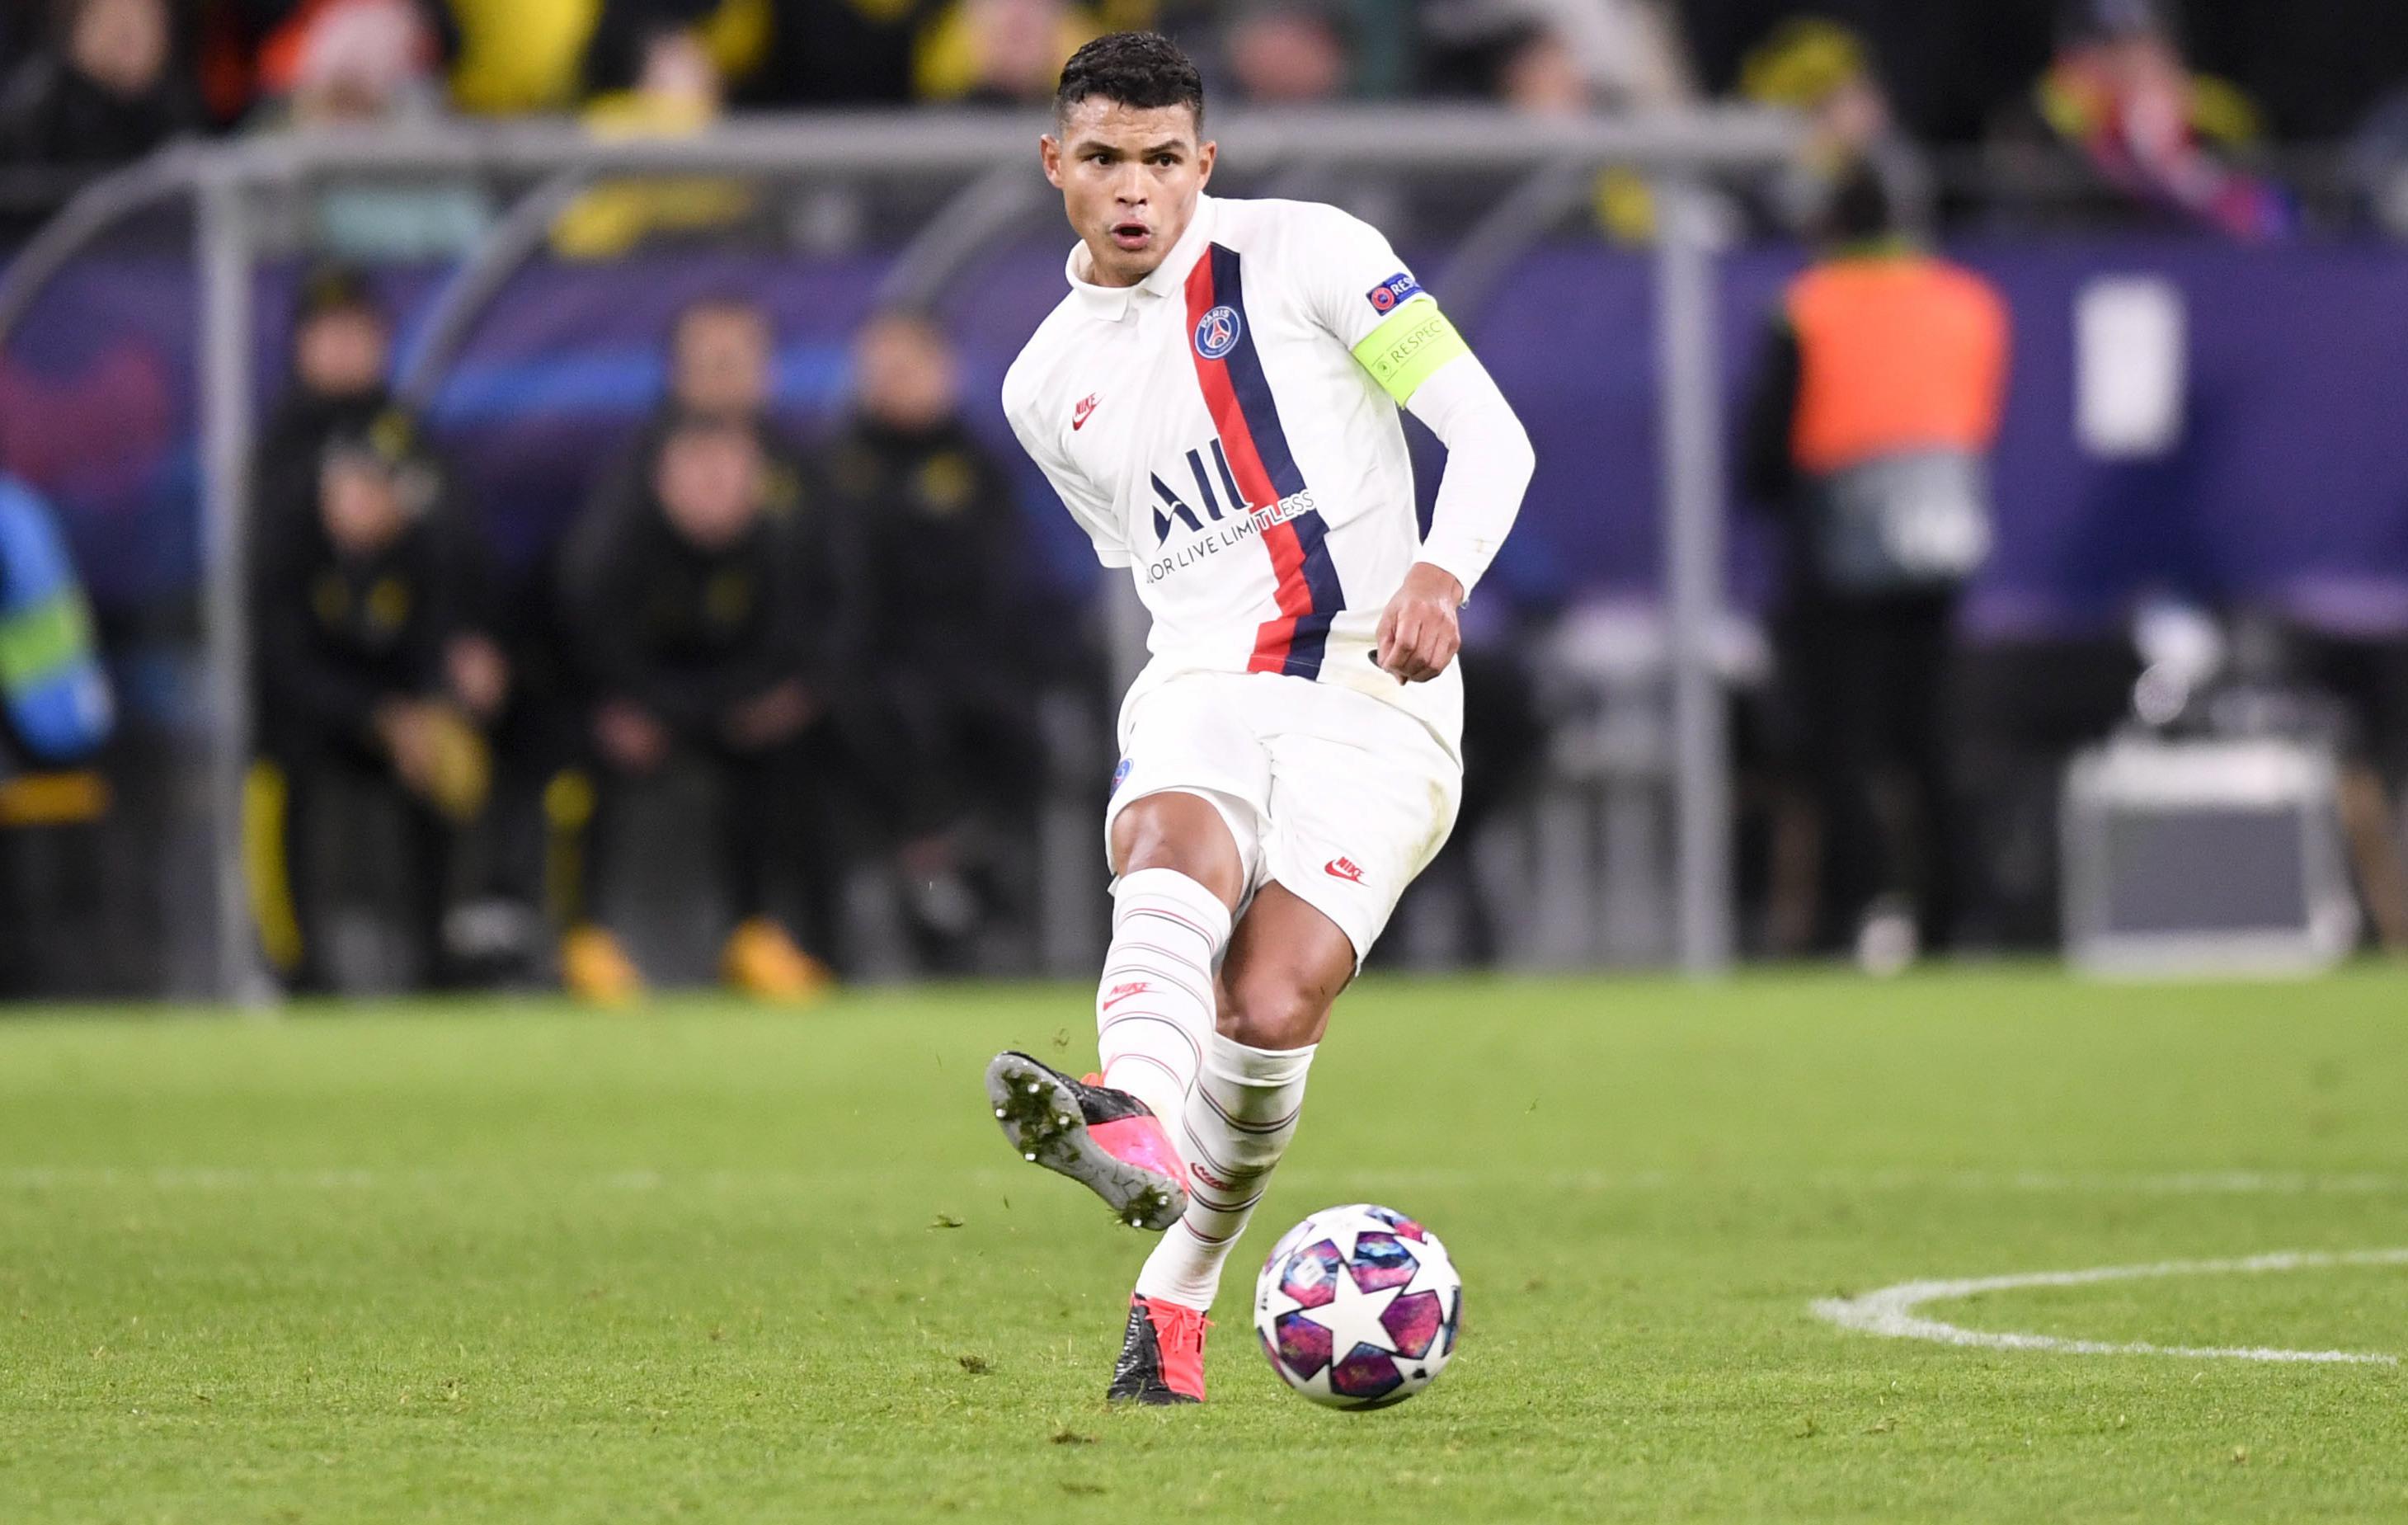 Football - Transferts - Journal du Mercato : Thiago Silva au coeur des réflexions du PSG